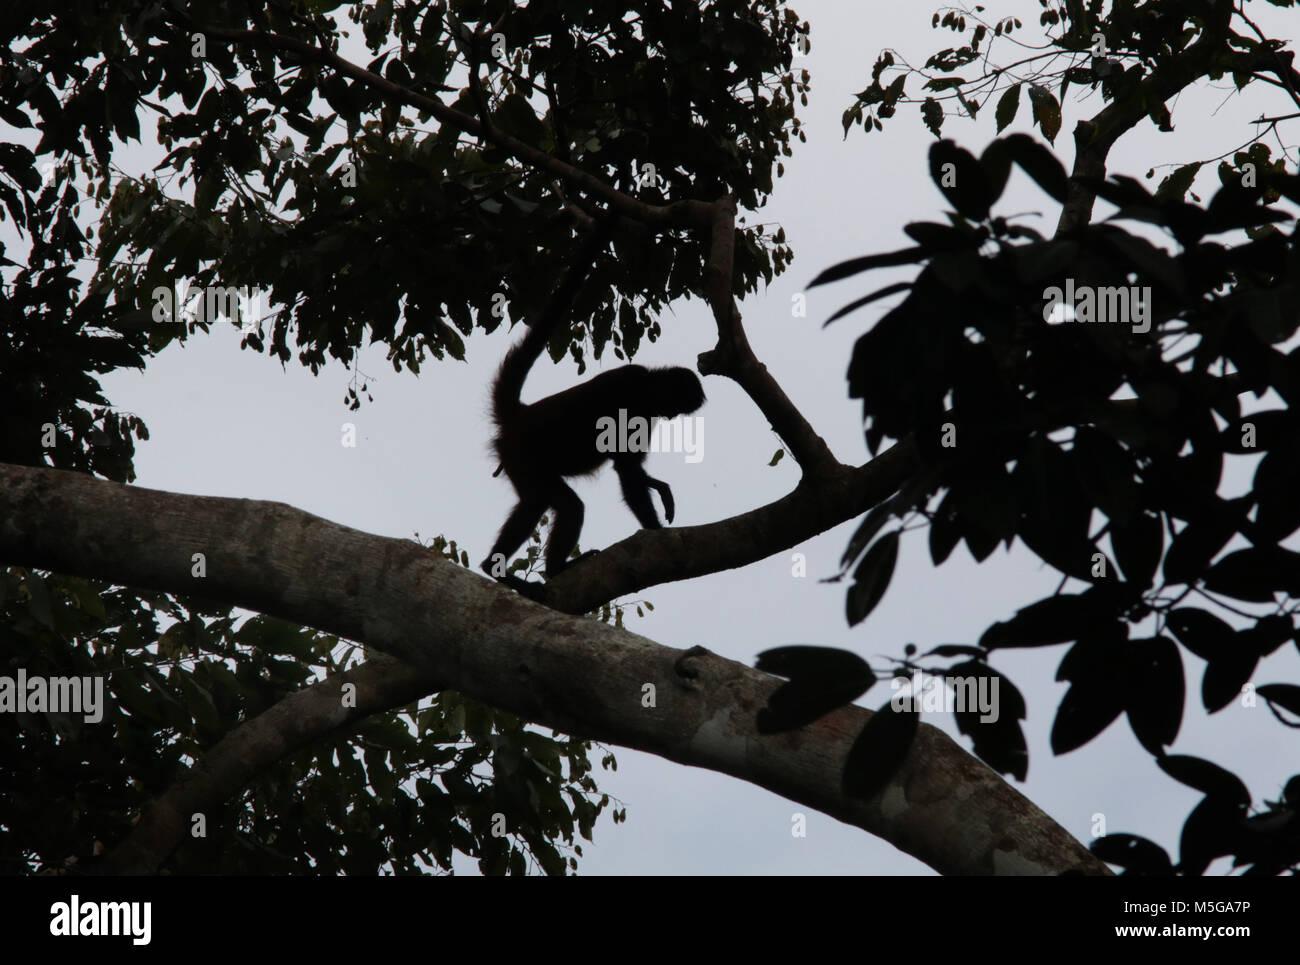 Spider Monkey (Ateles geoffroyi). Corcovado National Park, Osa Peninsula, Costa Rica. - Stock Image